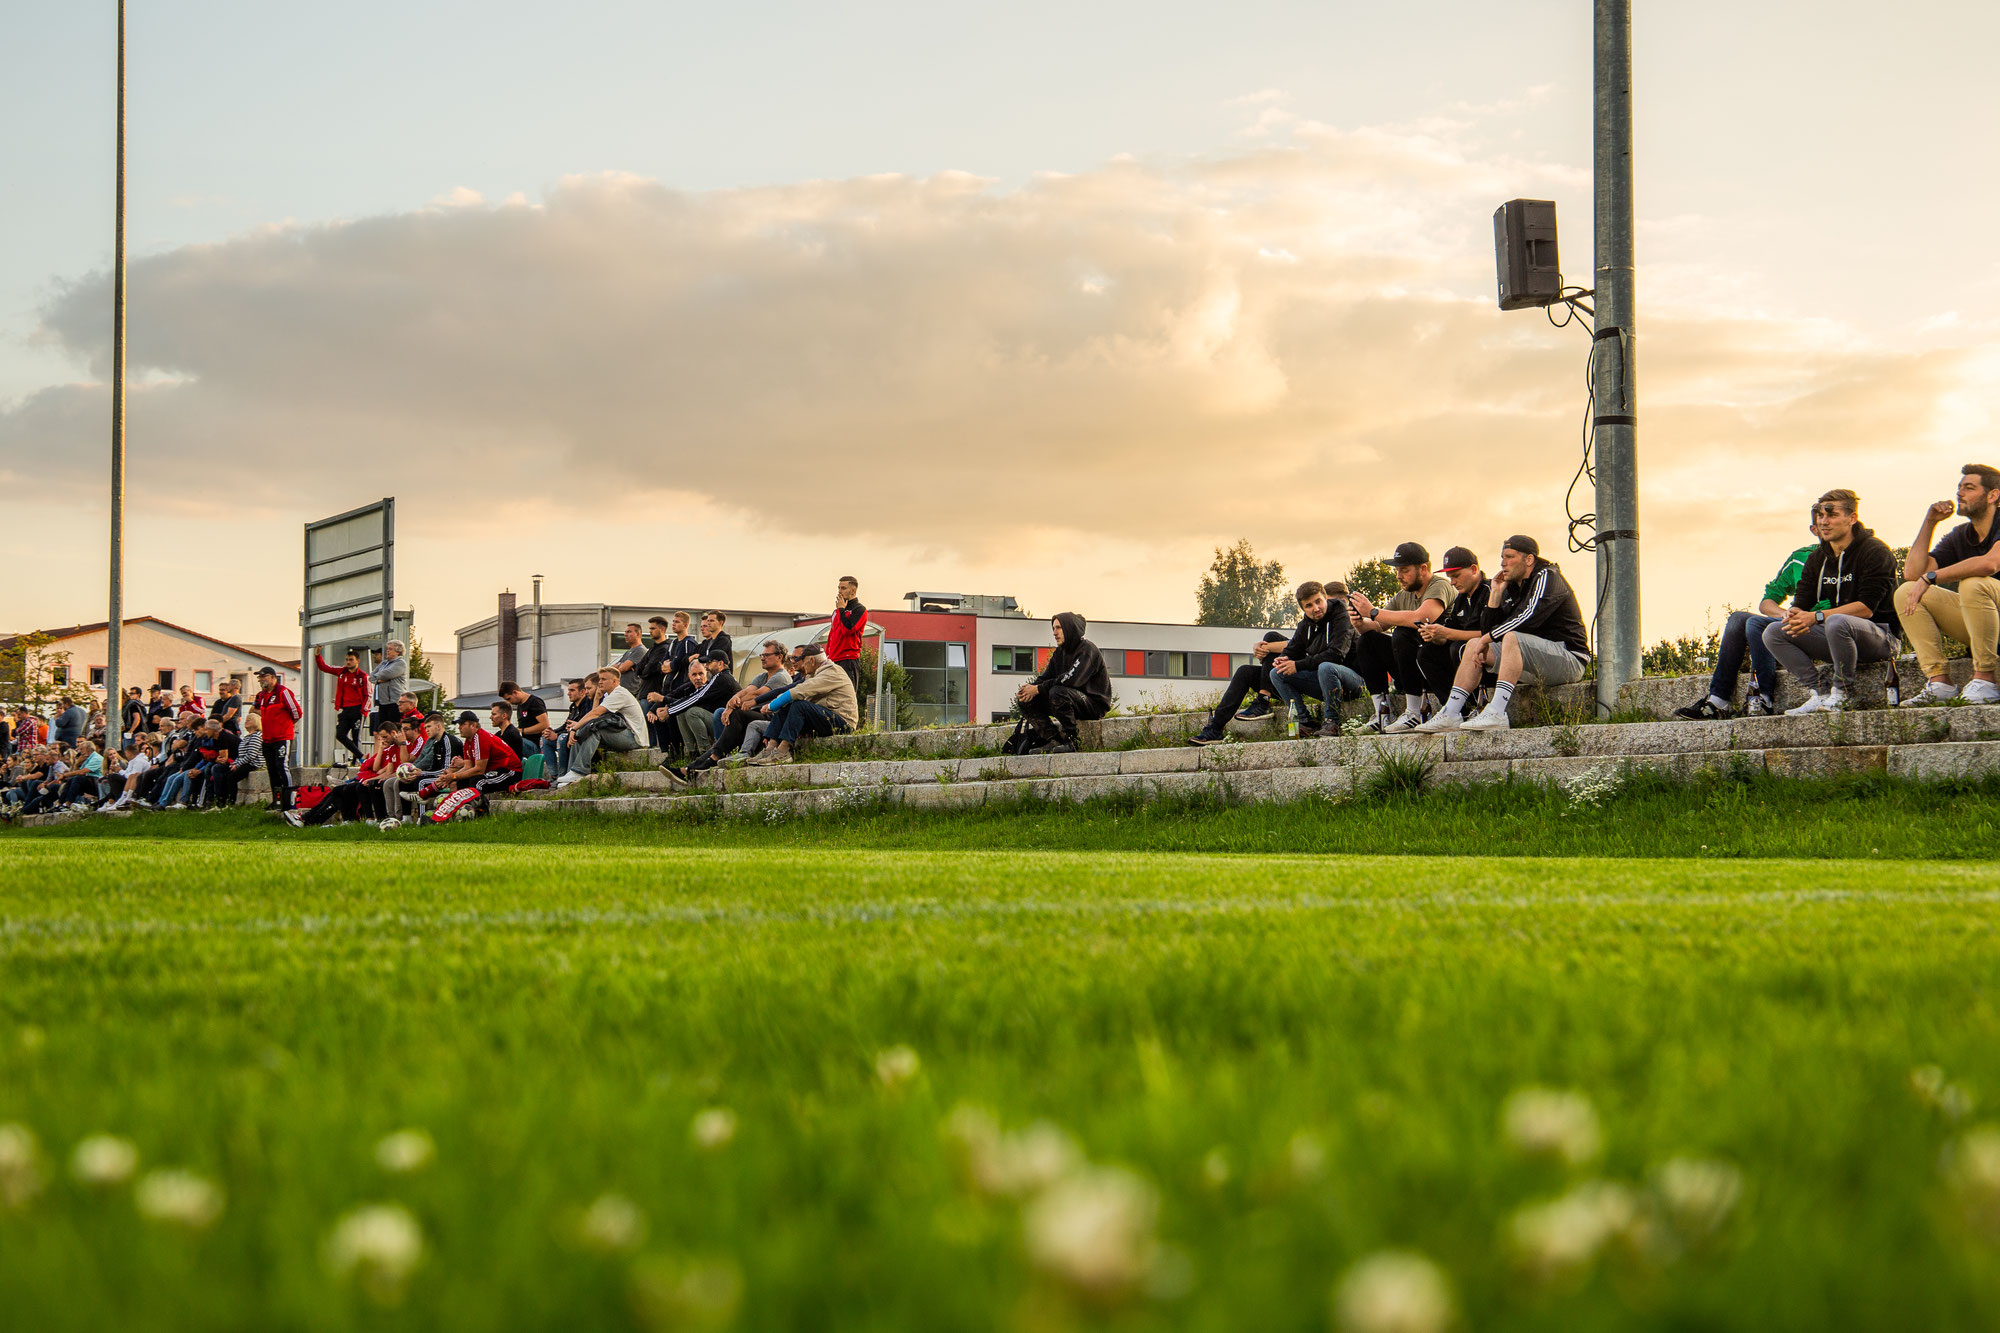 Groundhopping: TSG 08 Roth vs. SV Unterreichenbach